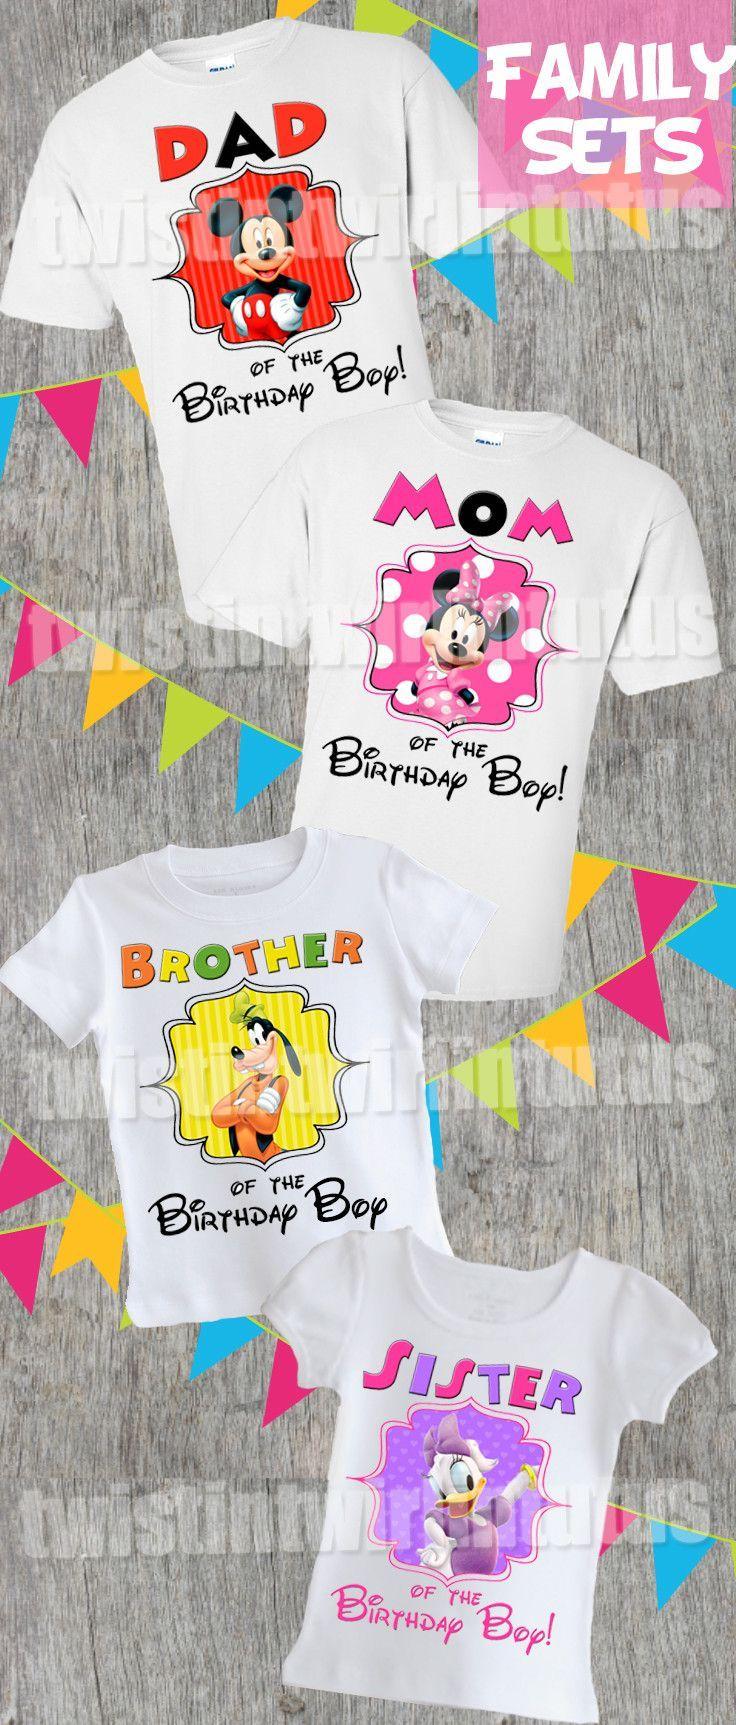 MICKEY UNISEX Shirt #1. FAMILY Matching Birthday Shirts Mickey Birthday Shirt ADD any name and age Mickey /& Pluto Birthday Shirts MICKEY MOUSE Birthday Party Mickey Shirts